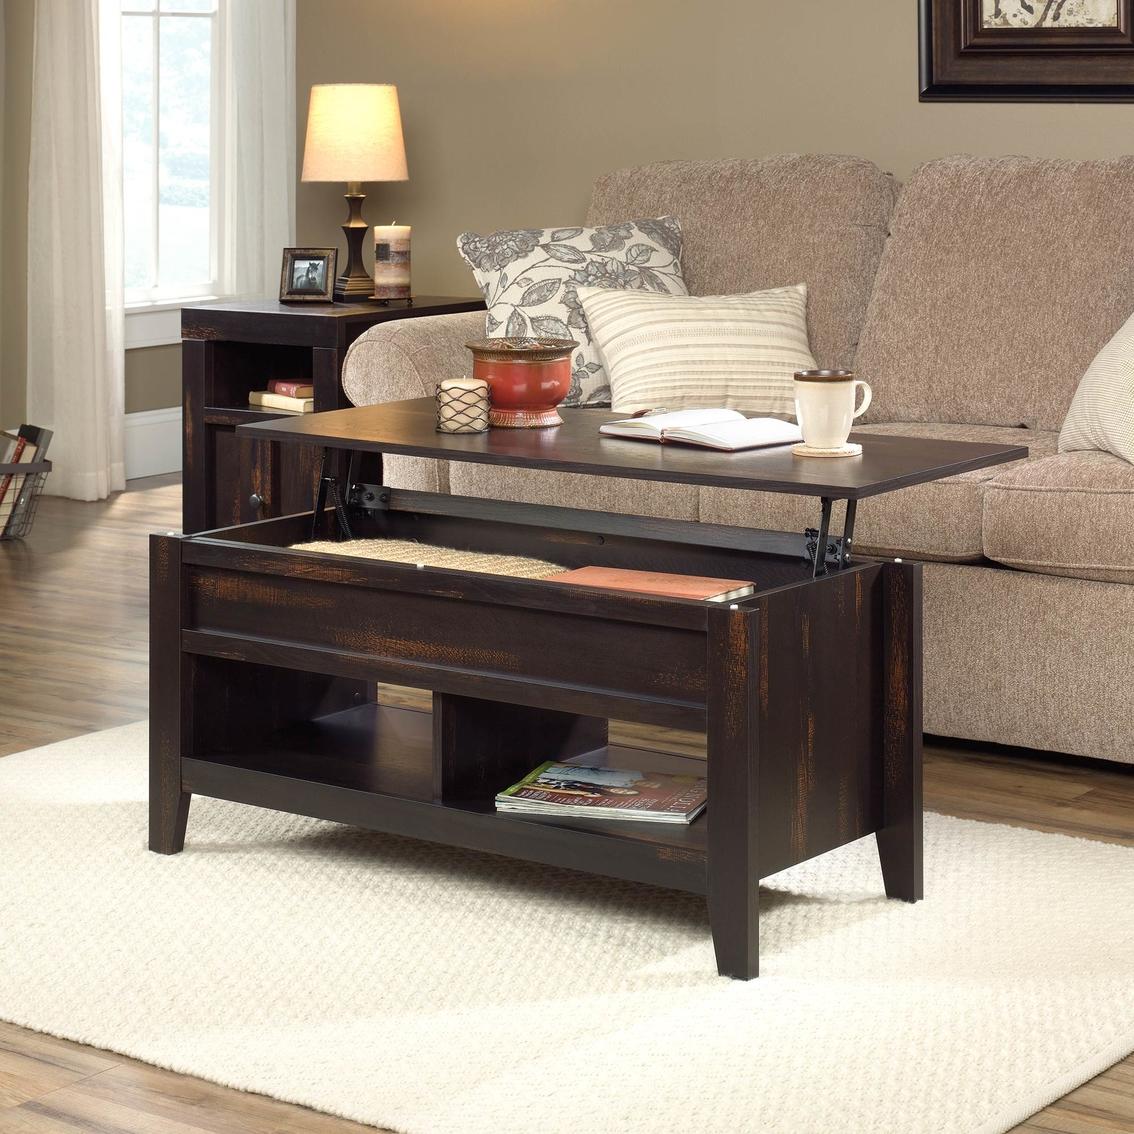 Sauder Dakota Pass Lift Top Coffee Table Living Room Tables Furniture Appliances Shop The Exchange